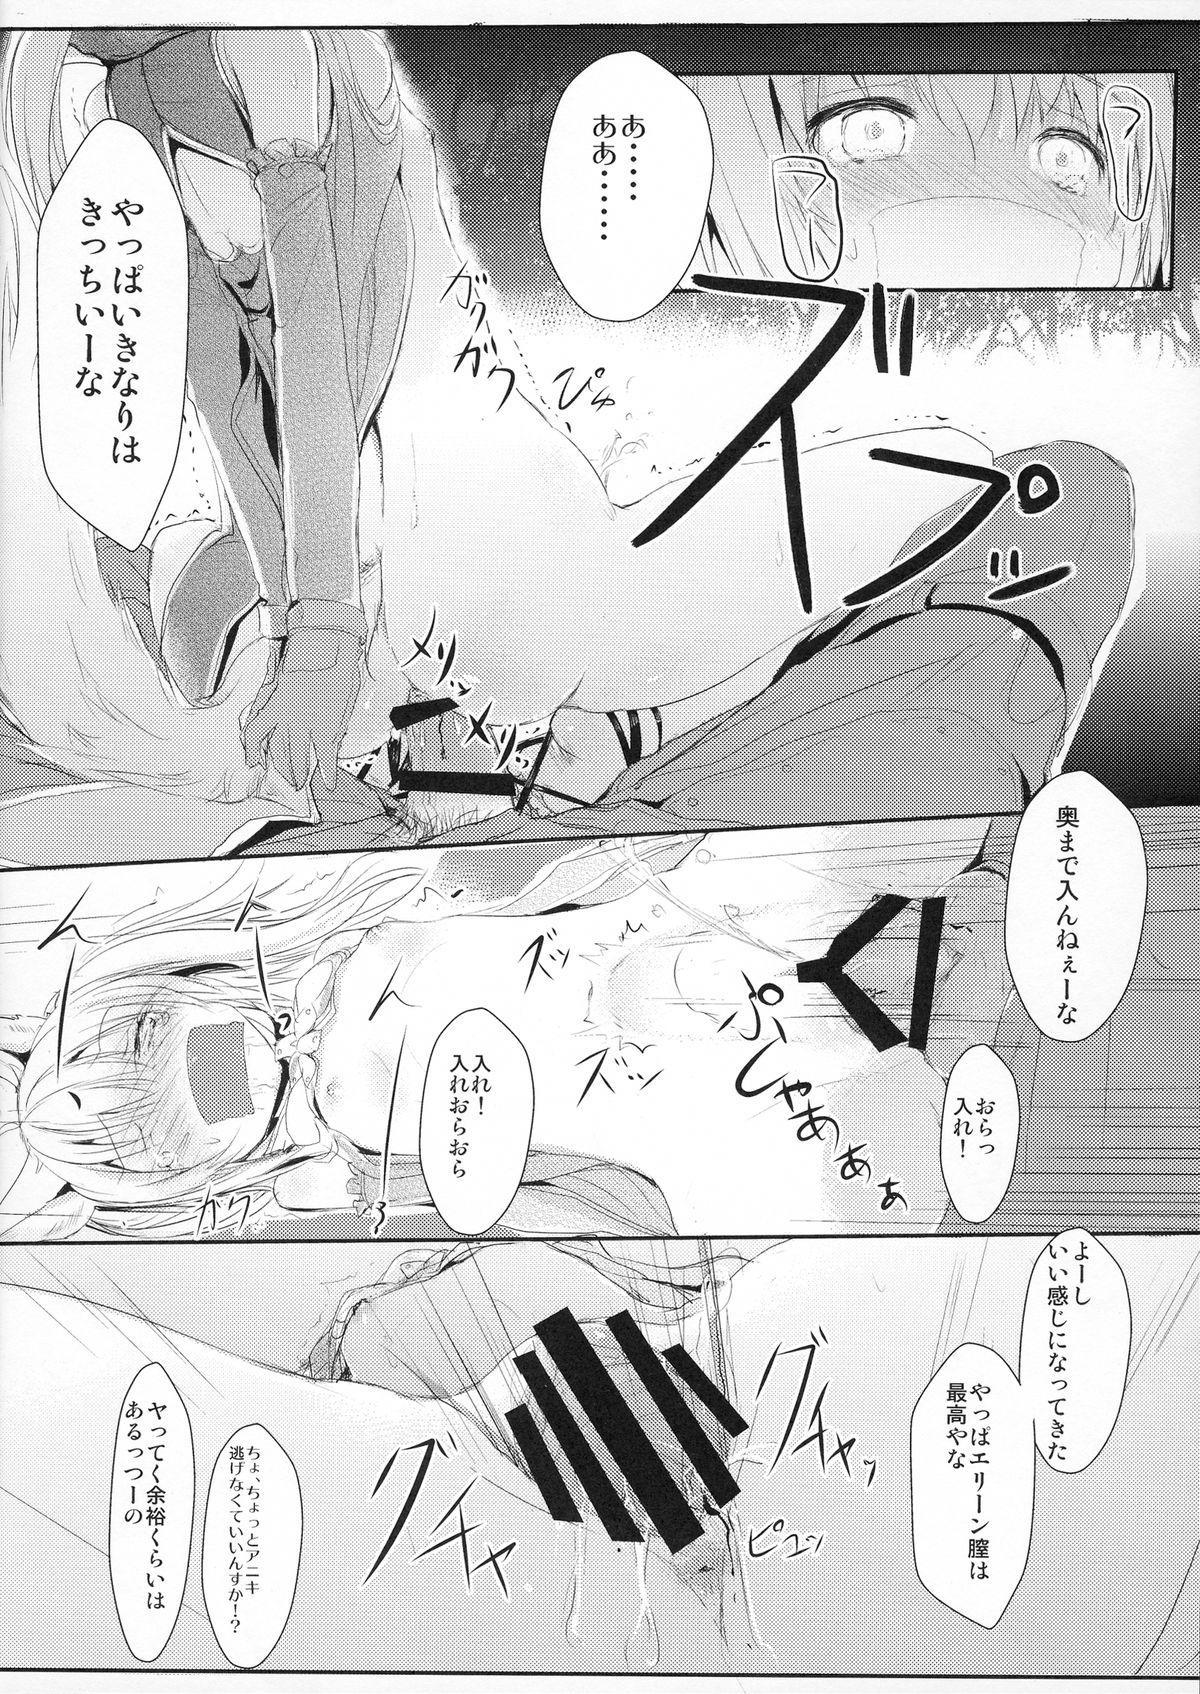 [Mirukomi (PRIMIL)] Human wa Erin-chan ni Hidoi Koto Shitai yo ne - ELIN's the best - (TERA The Exiled Realm of Arborea) 21